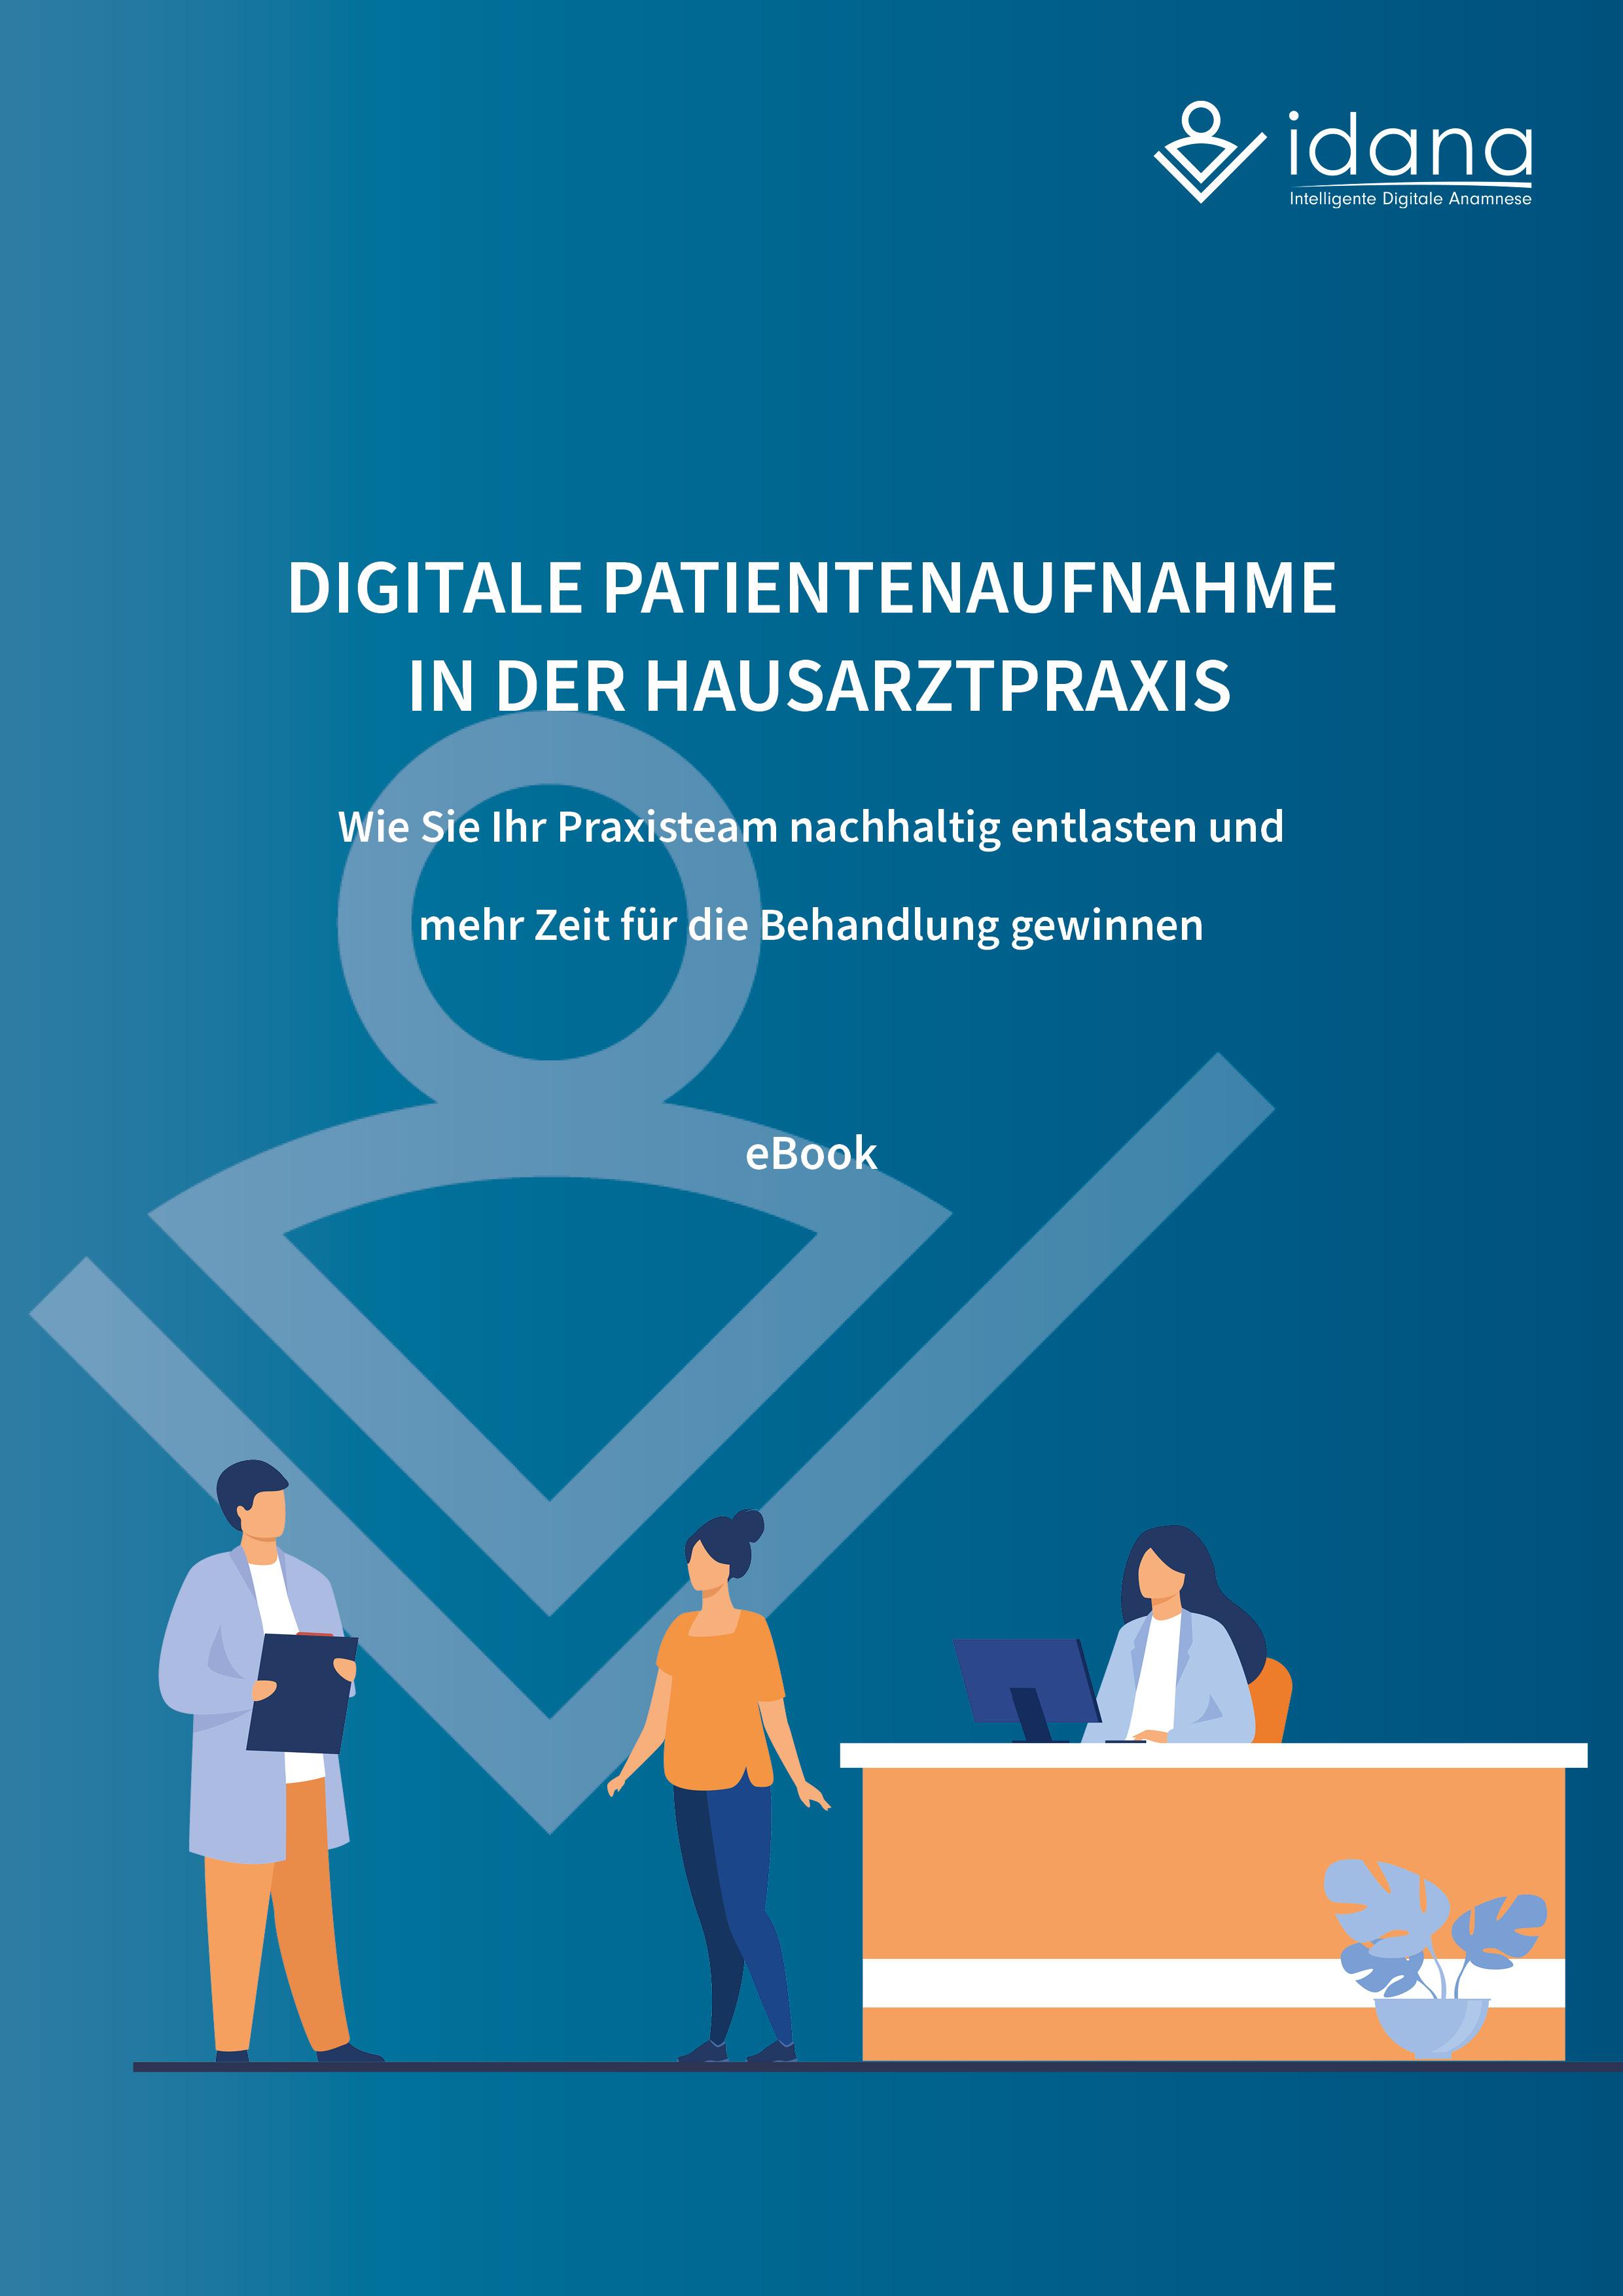 eBook _Digitale Patientenaufnahme in der Hausarztpraxis_